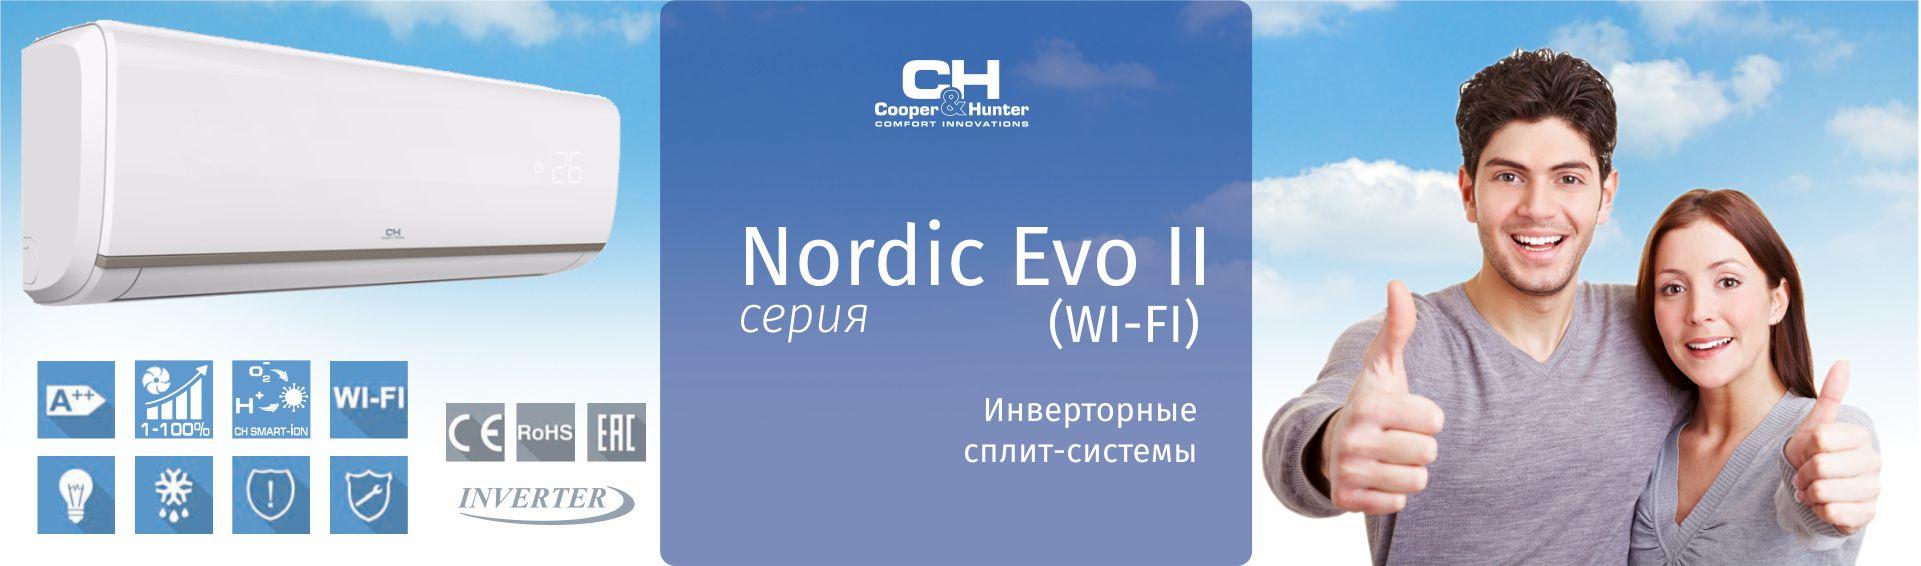 Серия Nordic Evo II (Wi-Fi, Inverter)